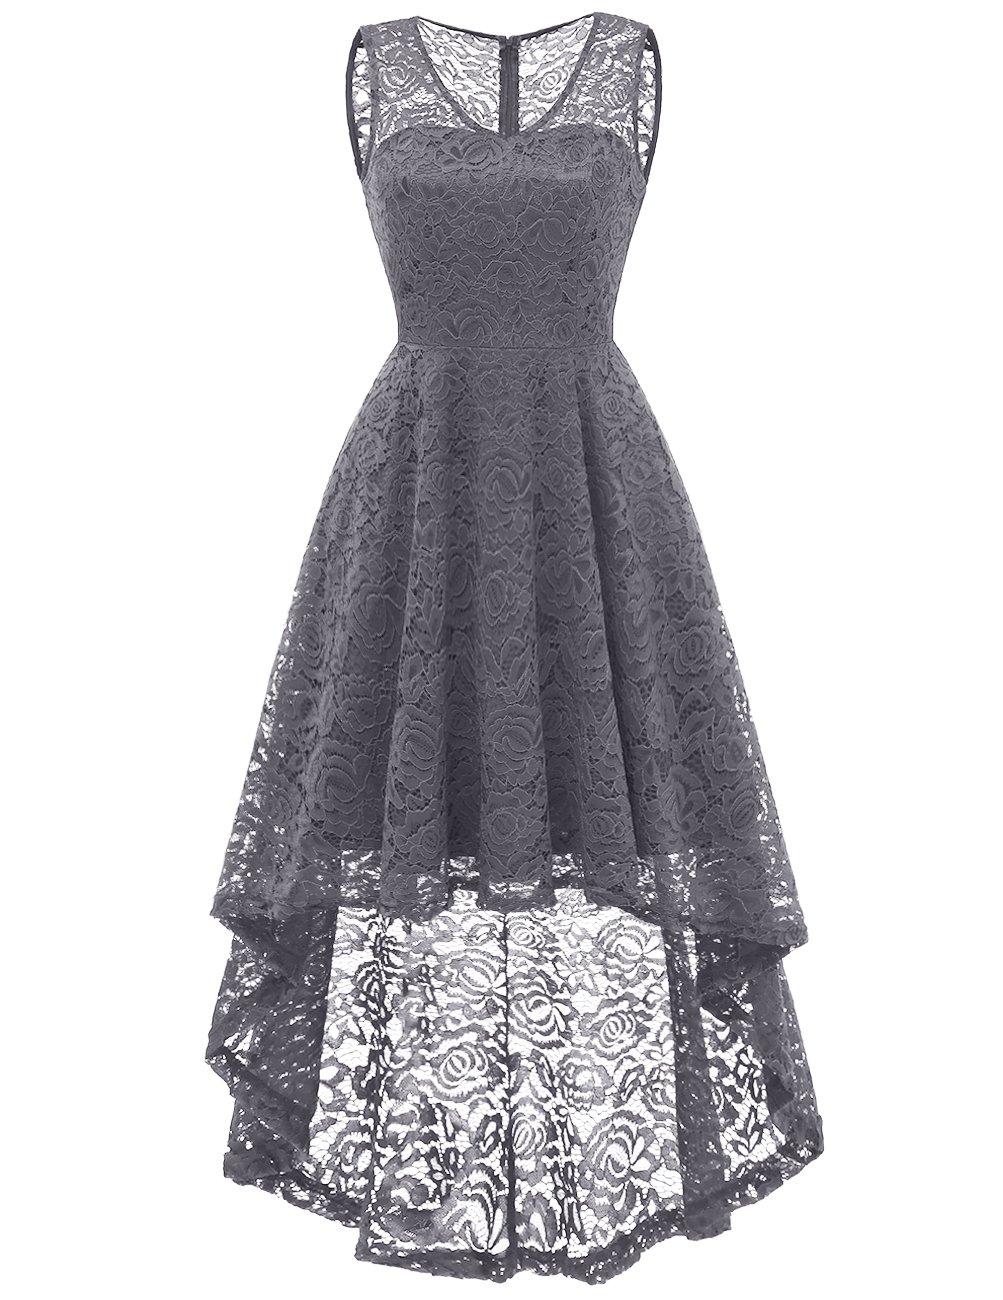 DRESSTELLS Women's Cocktail V-Neck Dress Floral Lace Hi-Lo Formal Swing Party Dress Grey XL